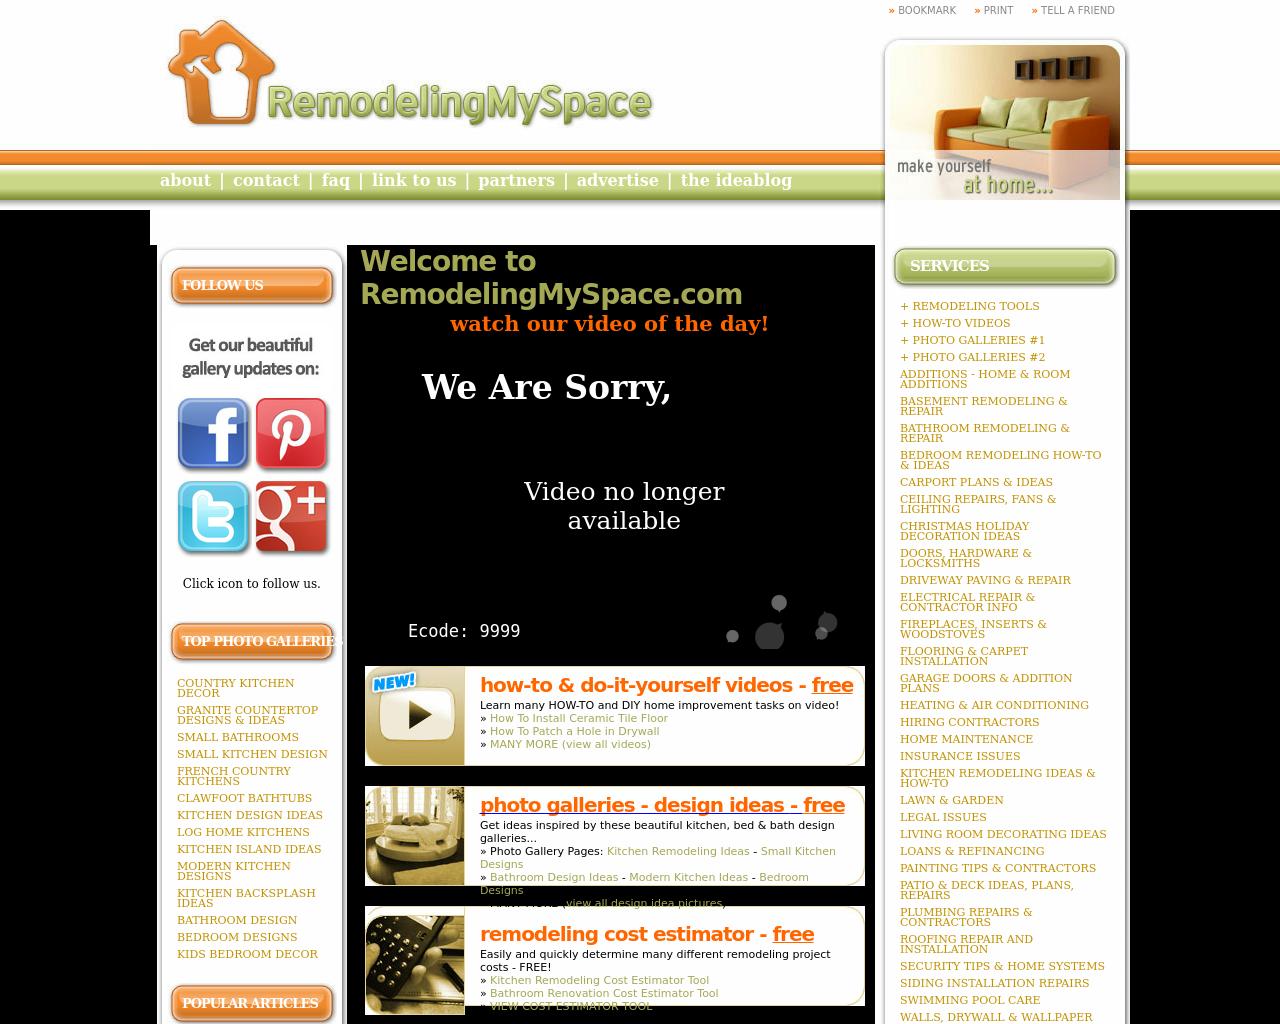 RemodelingMySpace-Advertising-Reviews-Pricing